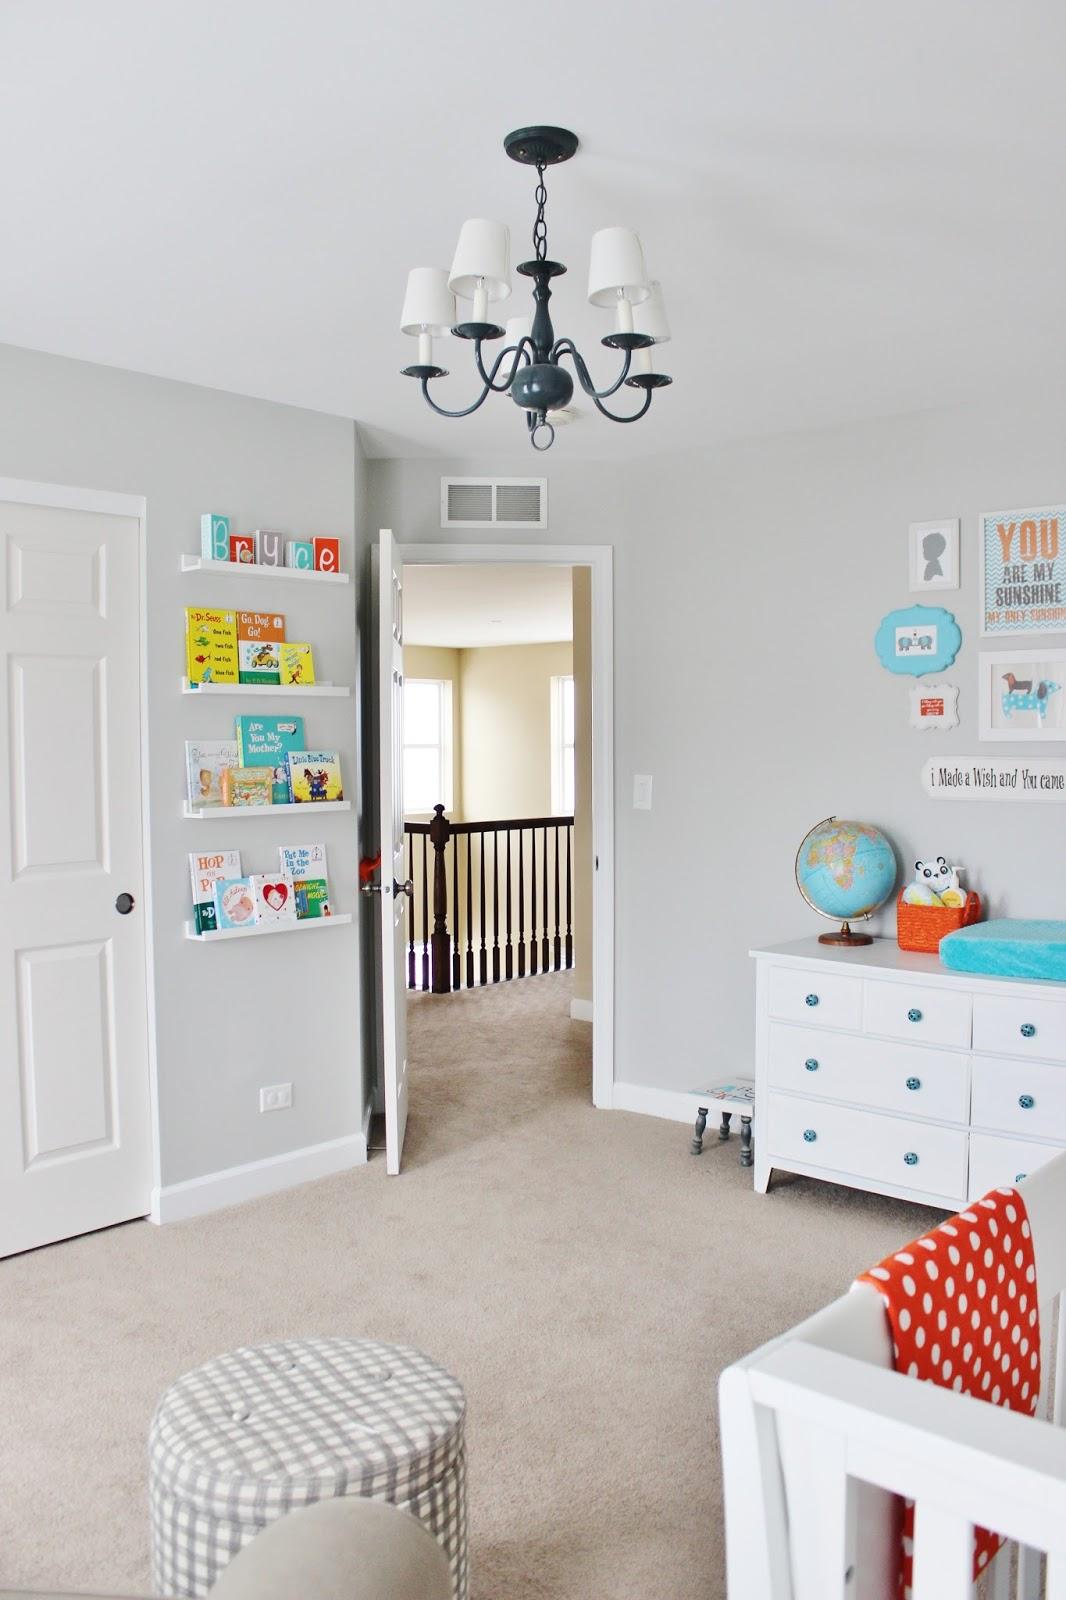 Delightfully Noted Home Tour - Modern Fresh Farmhouse Decorating Ideas - Little Boys Room Nursery - Book Wall Decorating Ideas